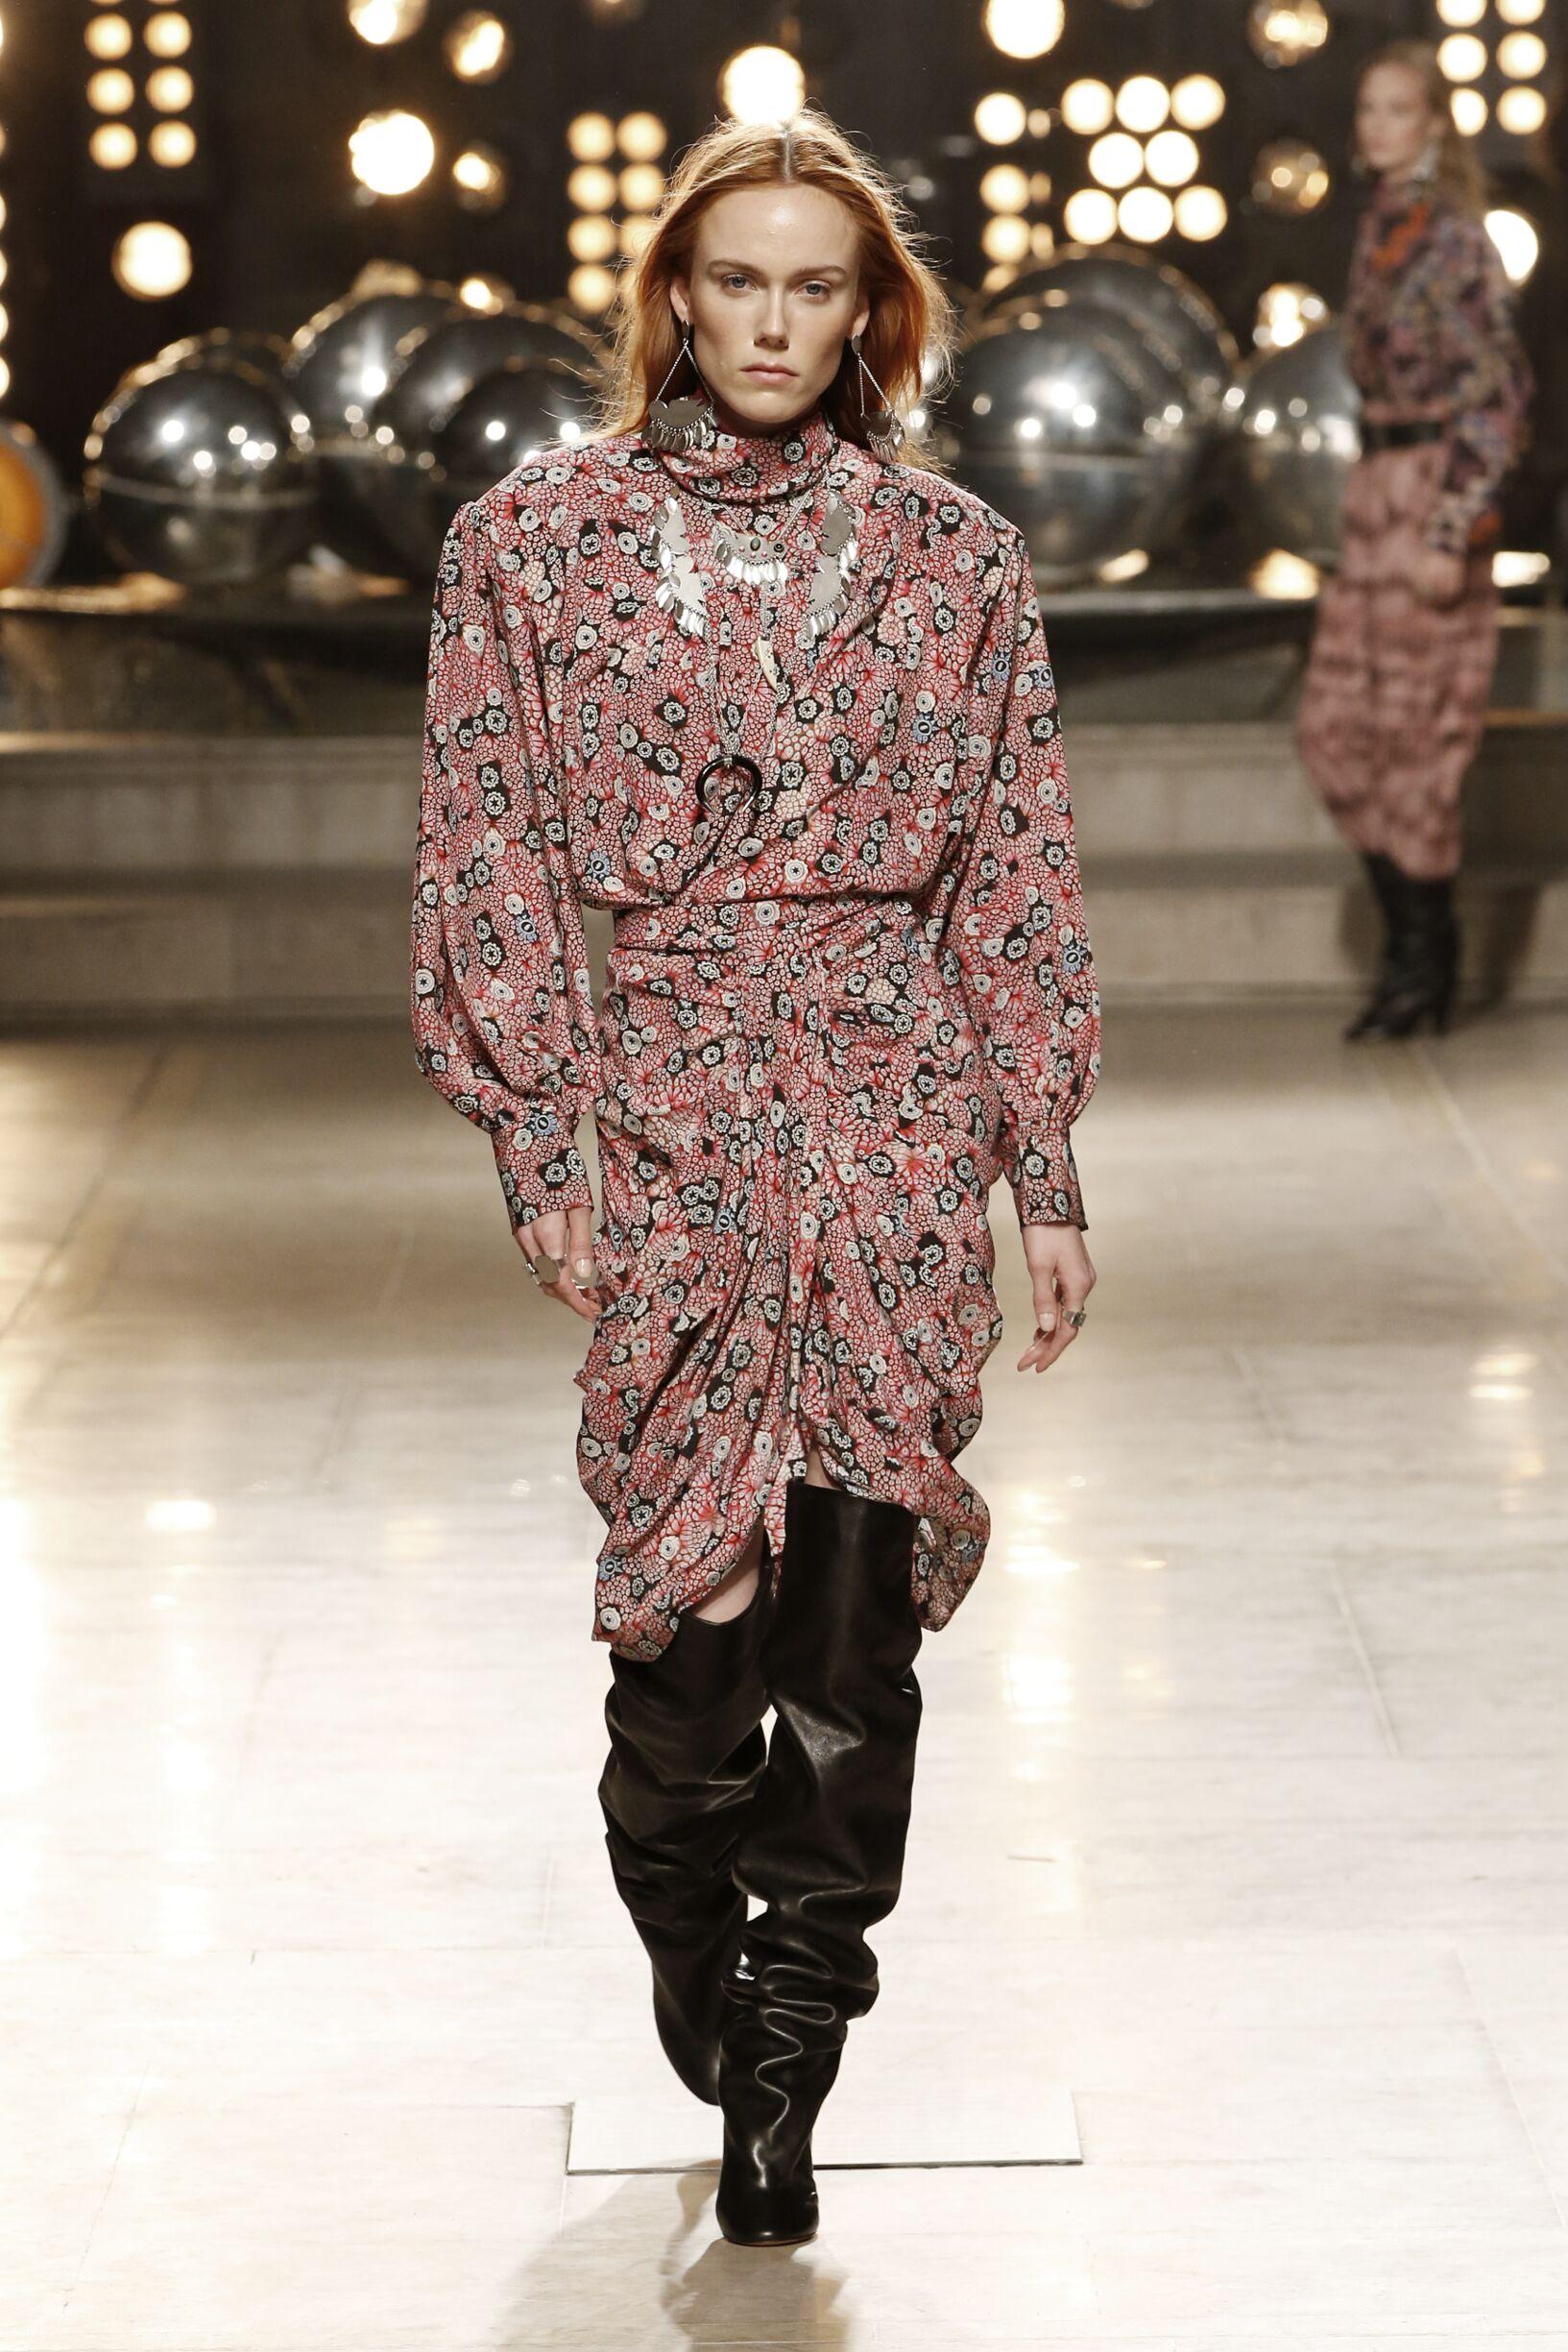 Catwalk Isabel Marant Women Fashion Show Winter 2019